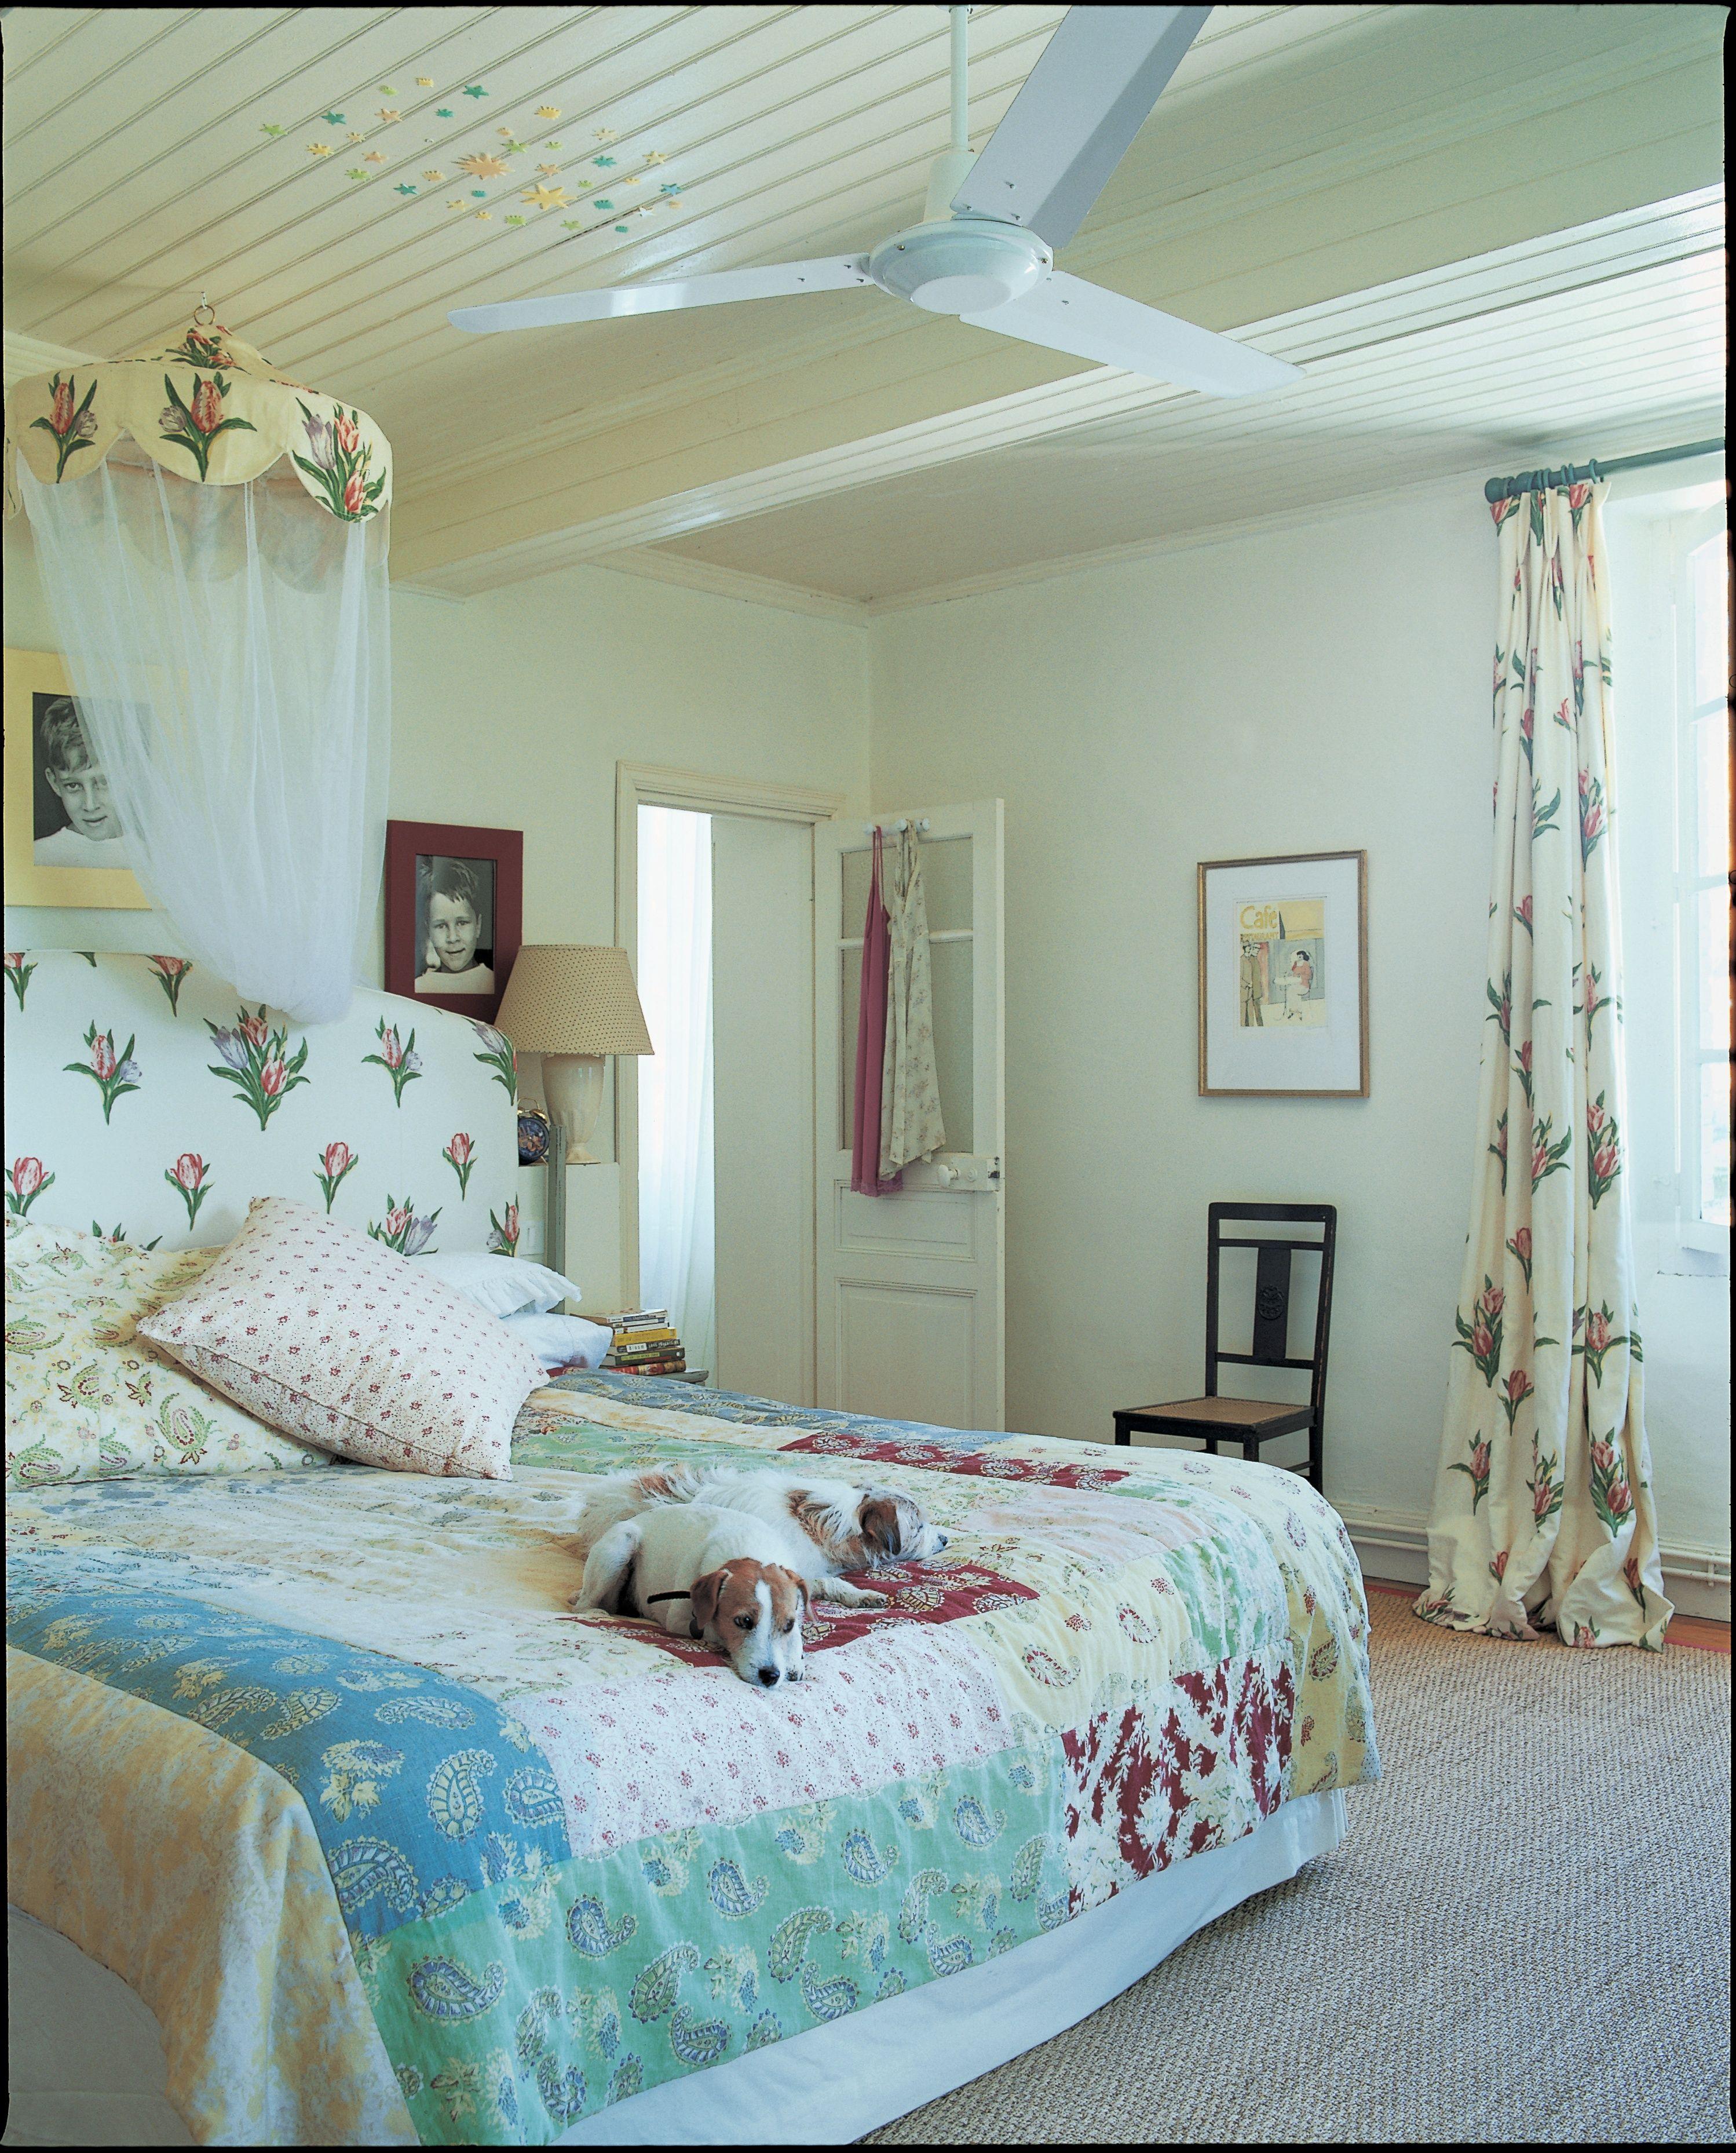 textiles kathryn ireland bedrooms home decor furniture bed rh pinterest com au